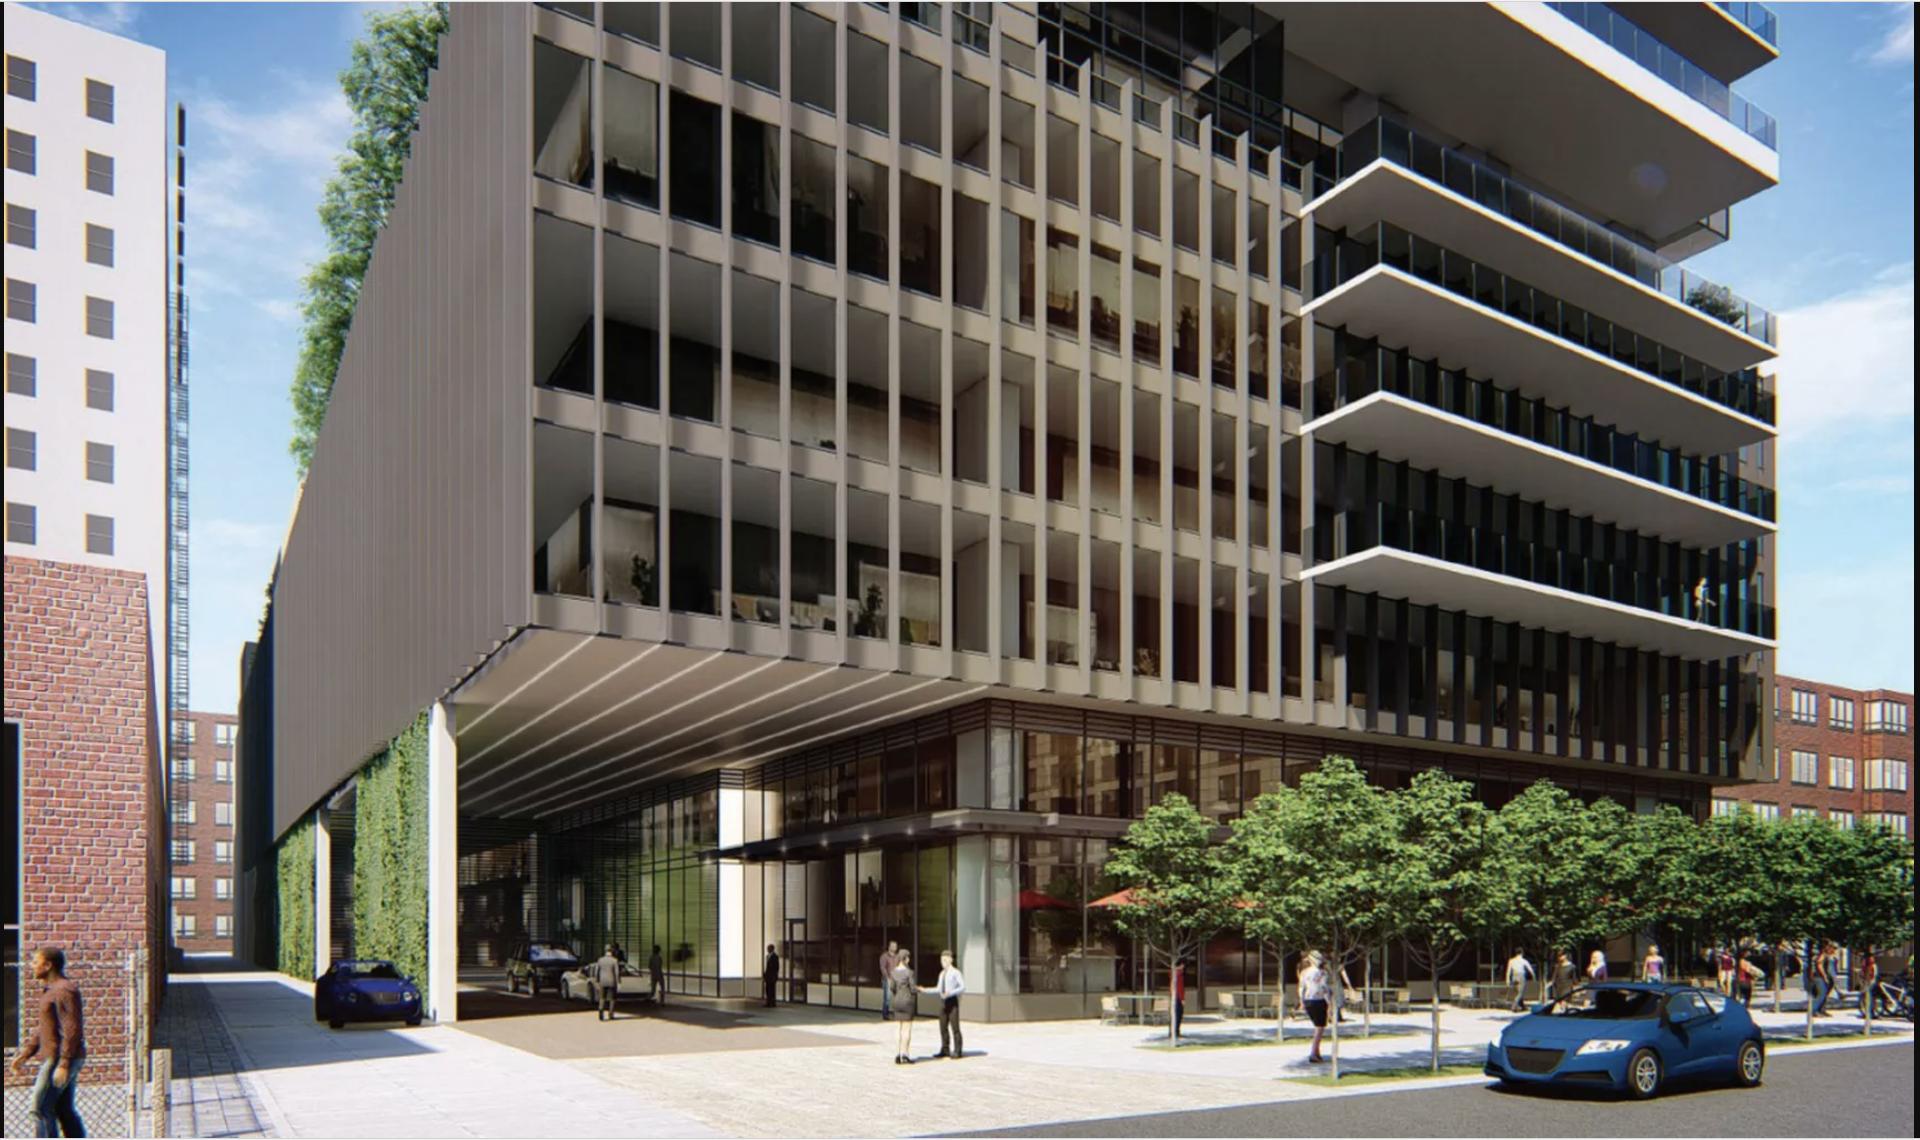 Los Angeles Real Estate Development